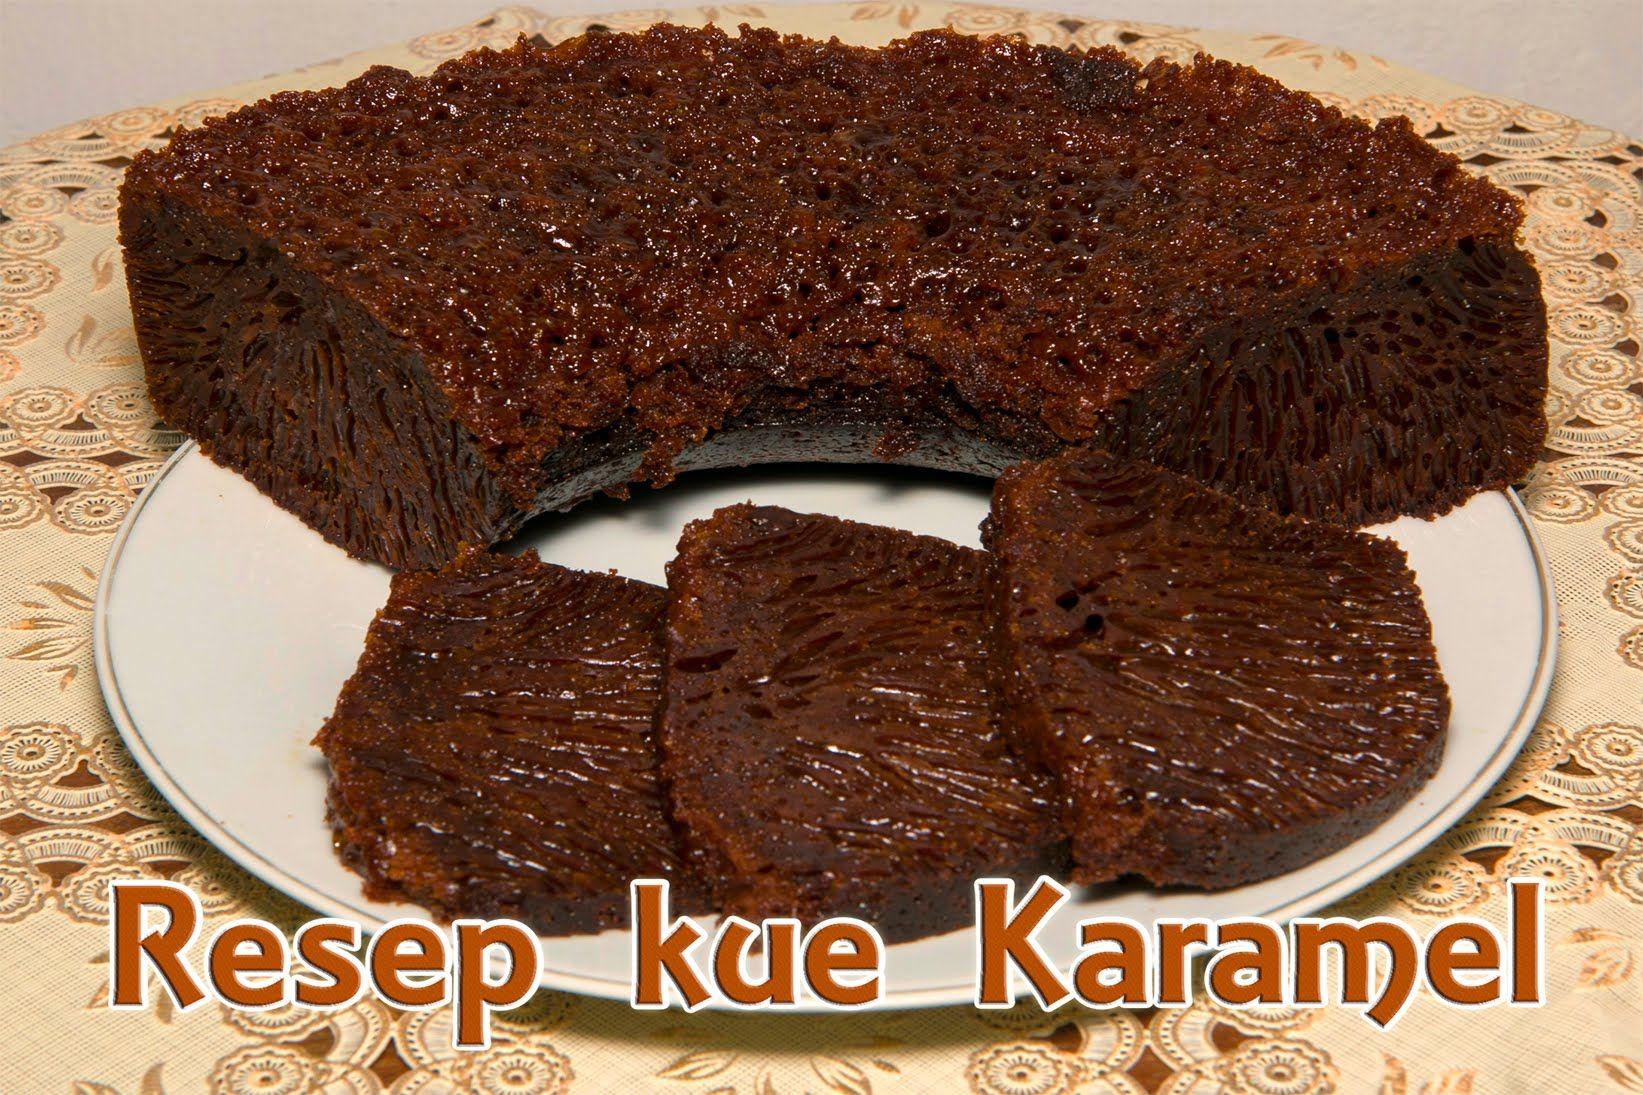 Cara Membuat Kue Karamel 2 Caramel Desserts Recipes Cake Kentang Goreng By Almaira Sf Video Resep Dan Panduan Atau Sarang Semut